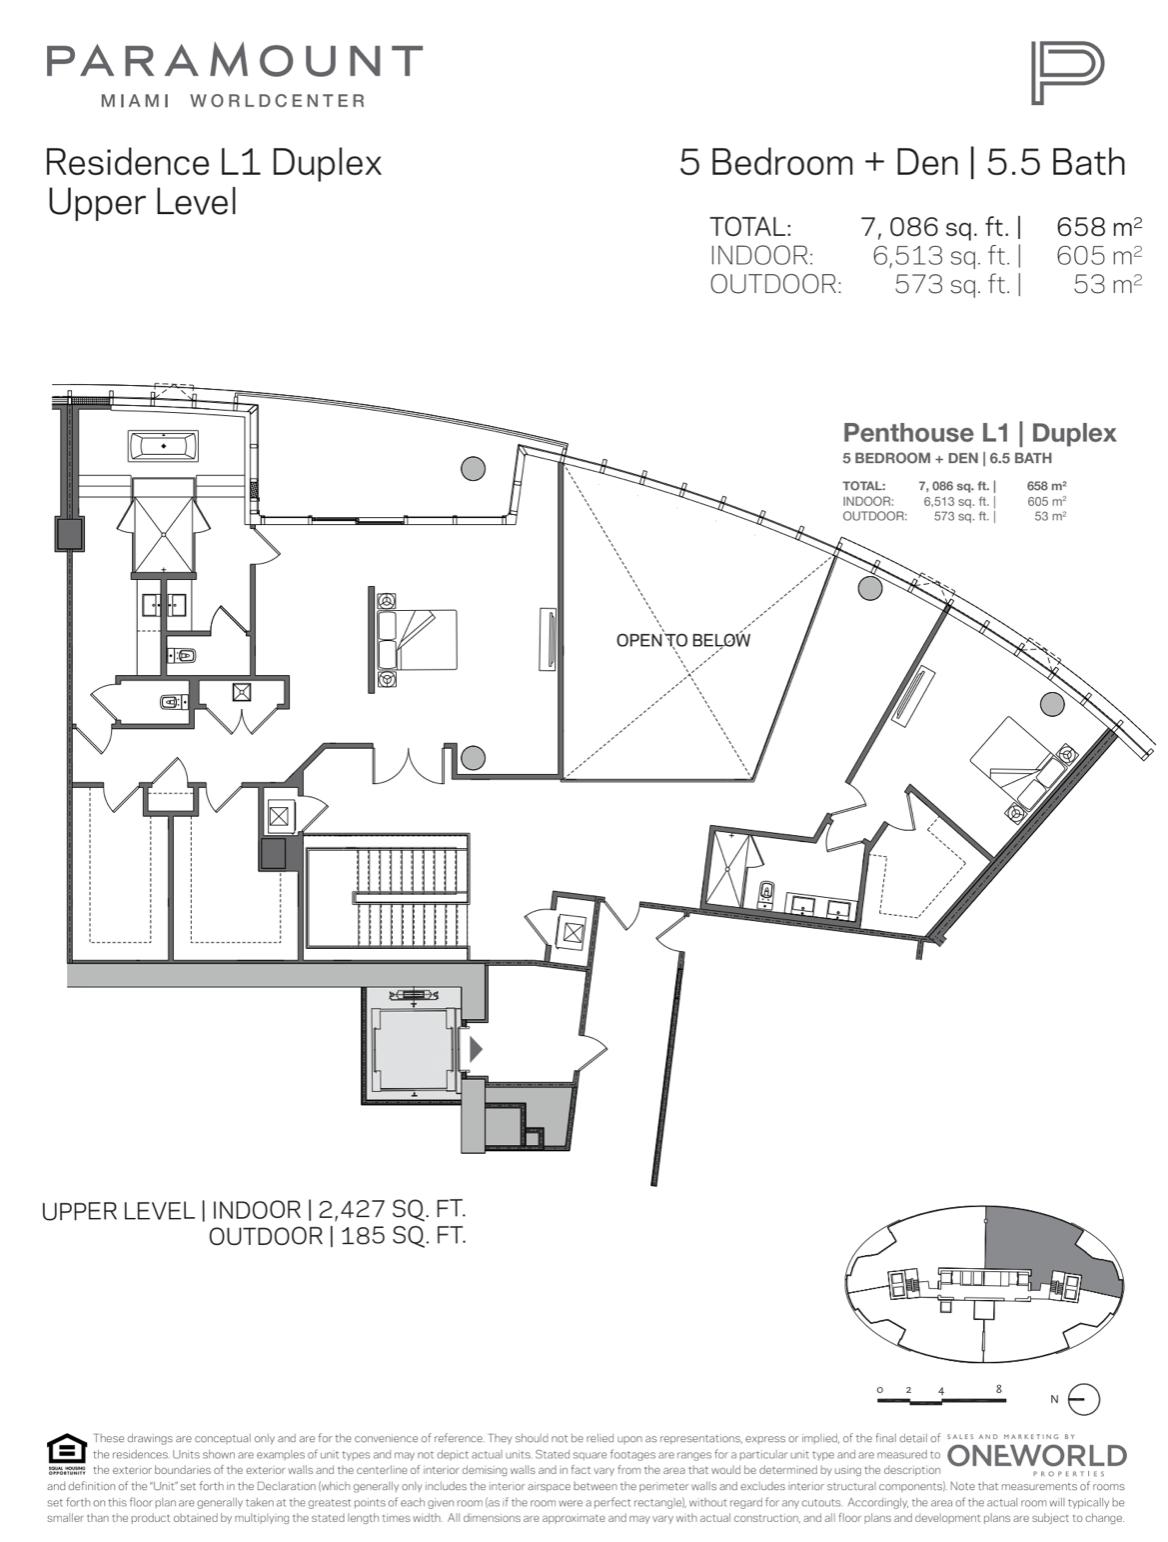 PMWC Penthouse L1 Upper Level